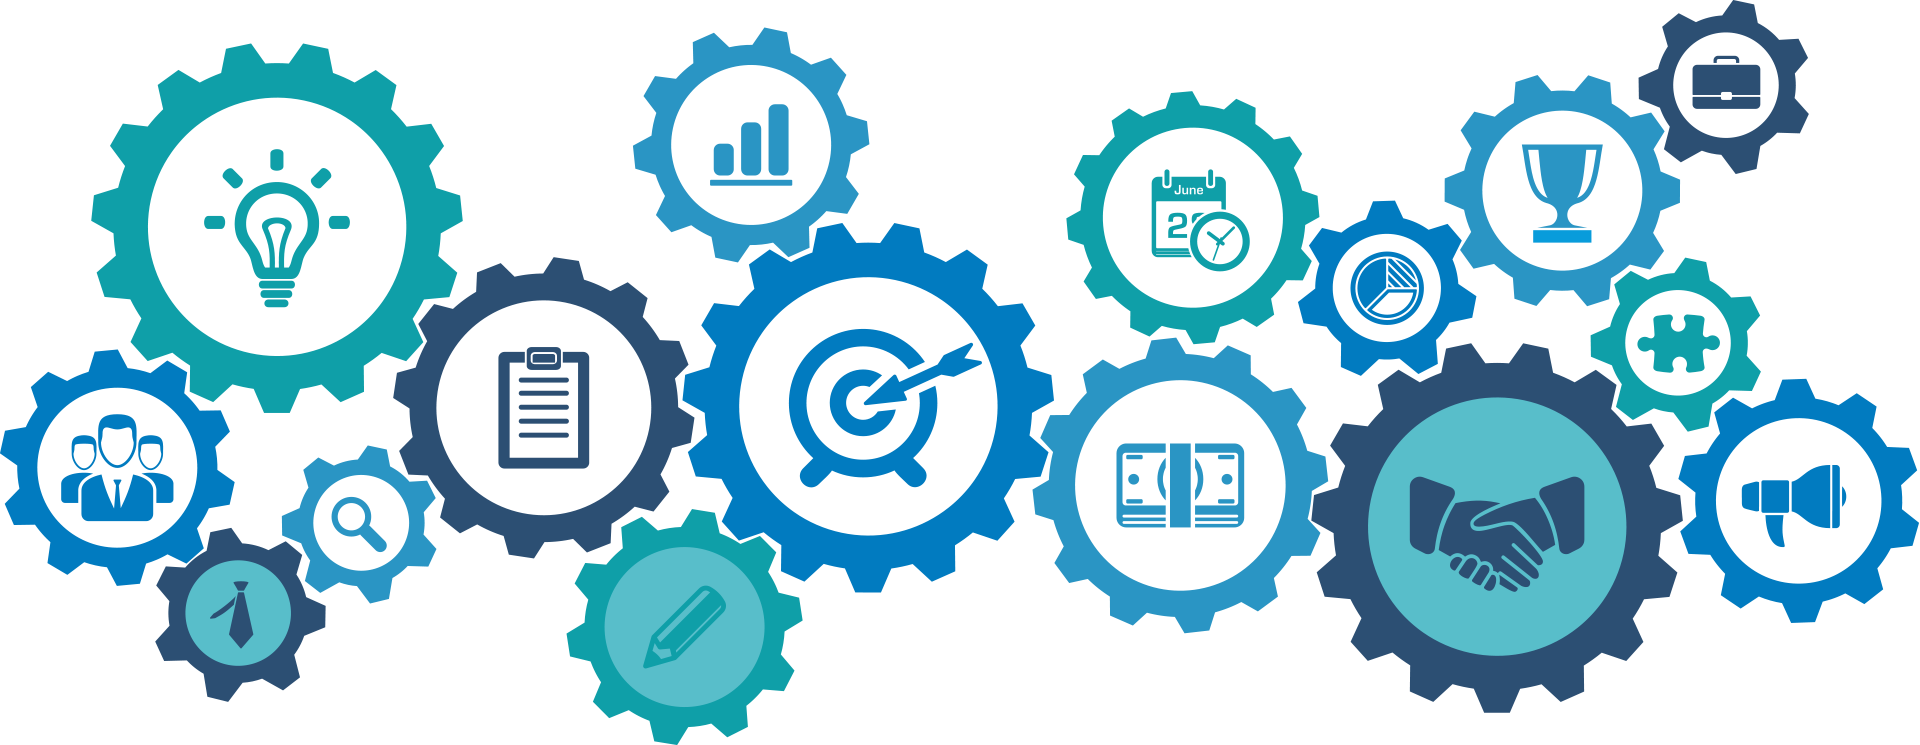 SEO Services - Era Information Technology